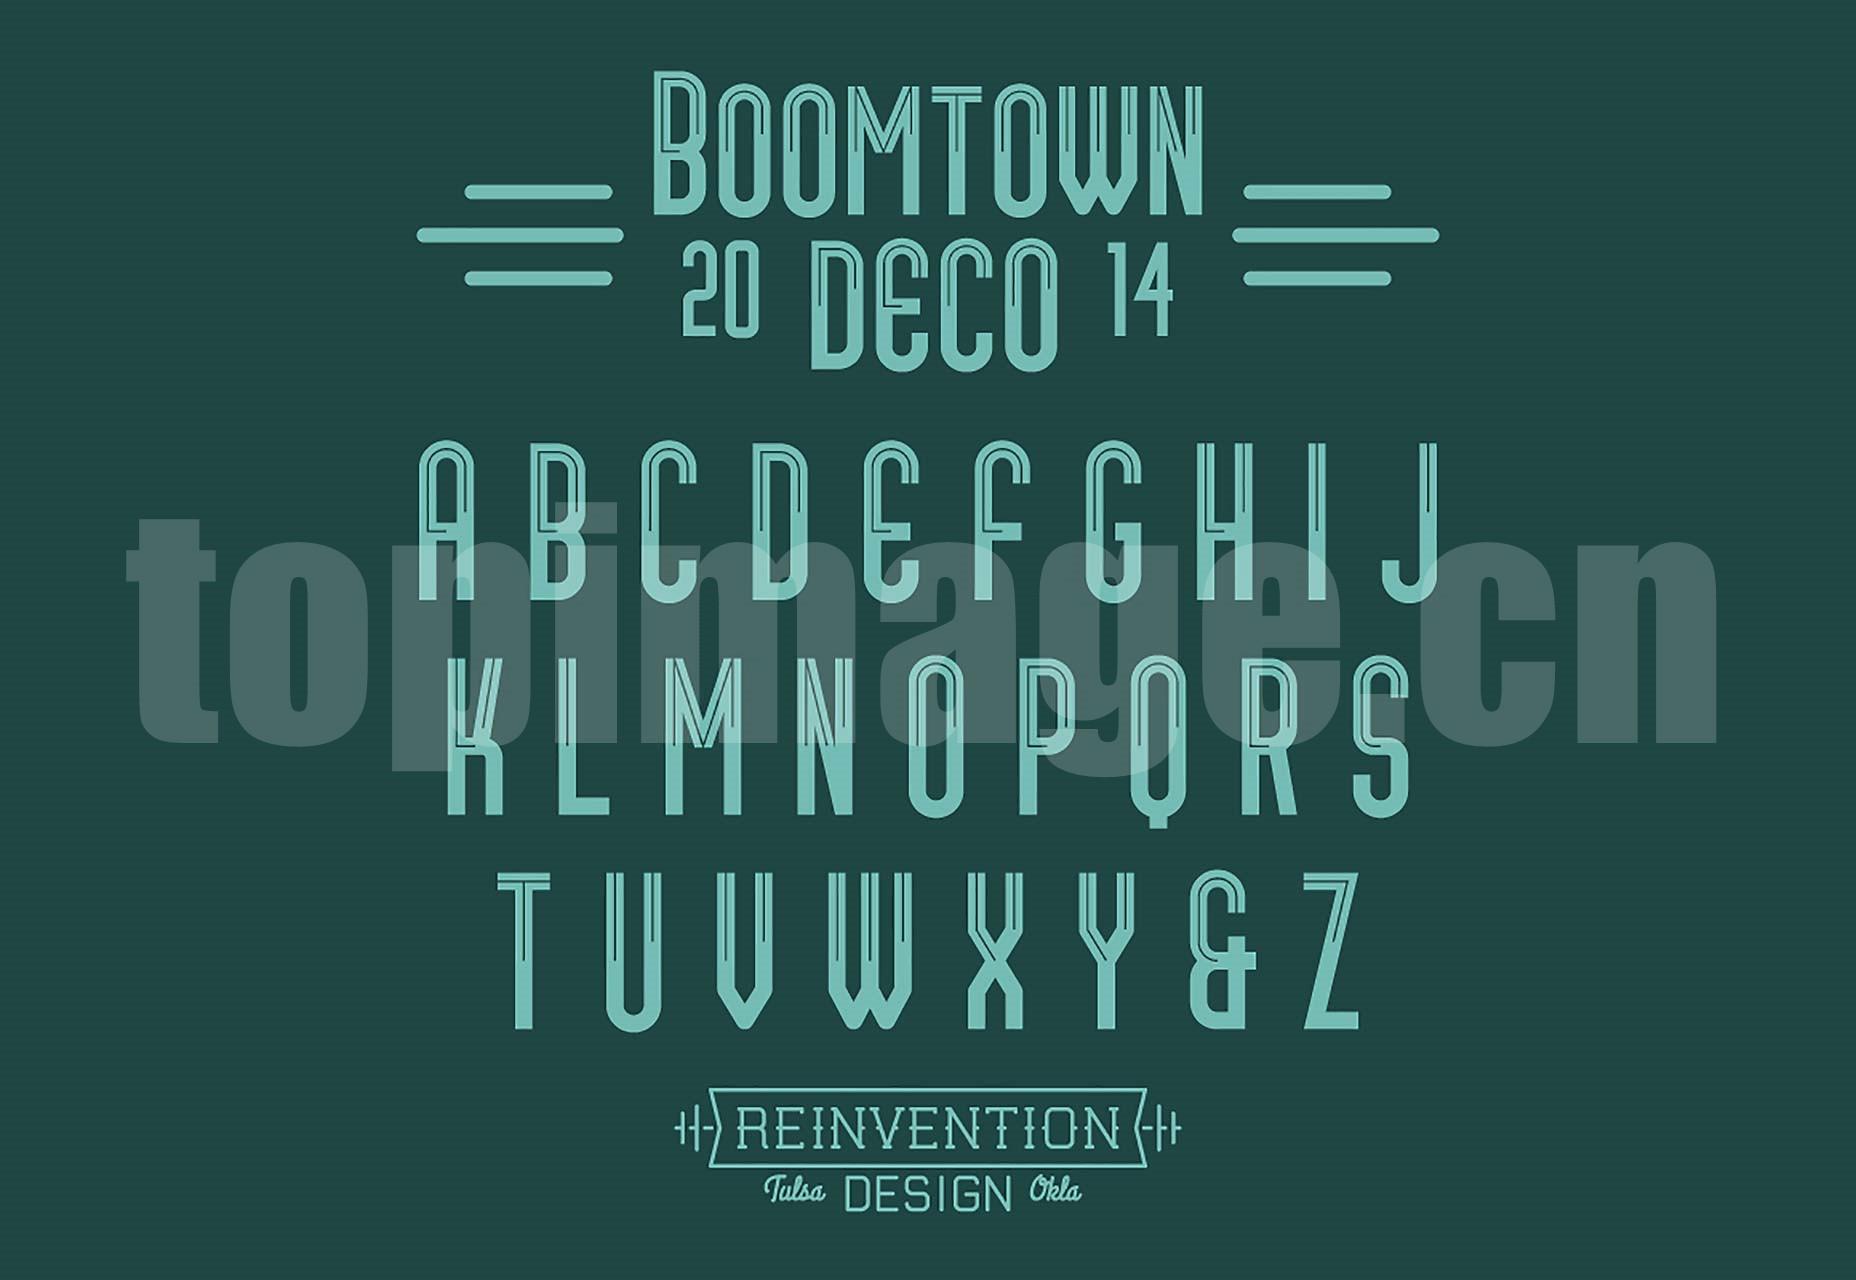 BOOMTOWN经典英文字体海报下载